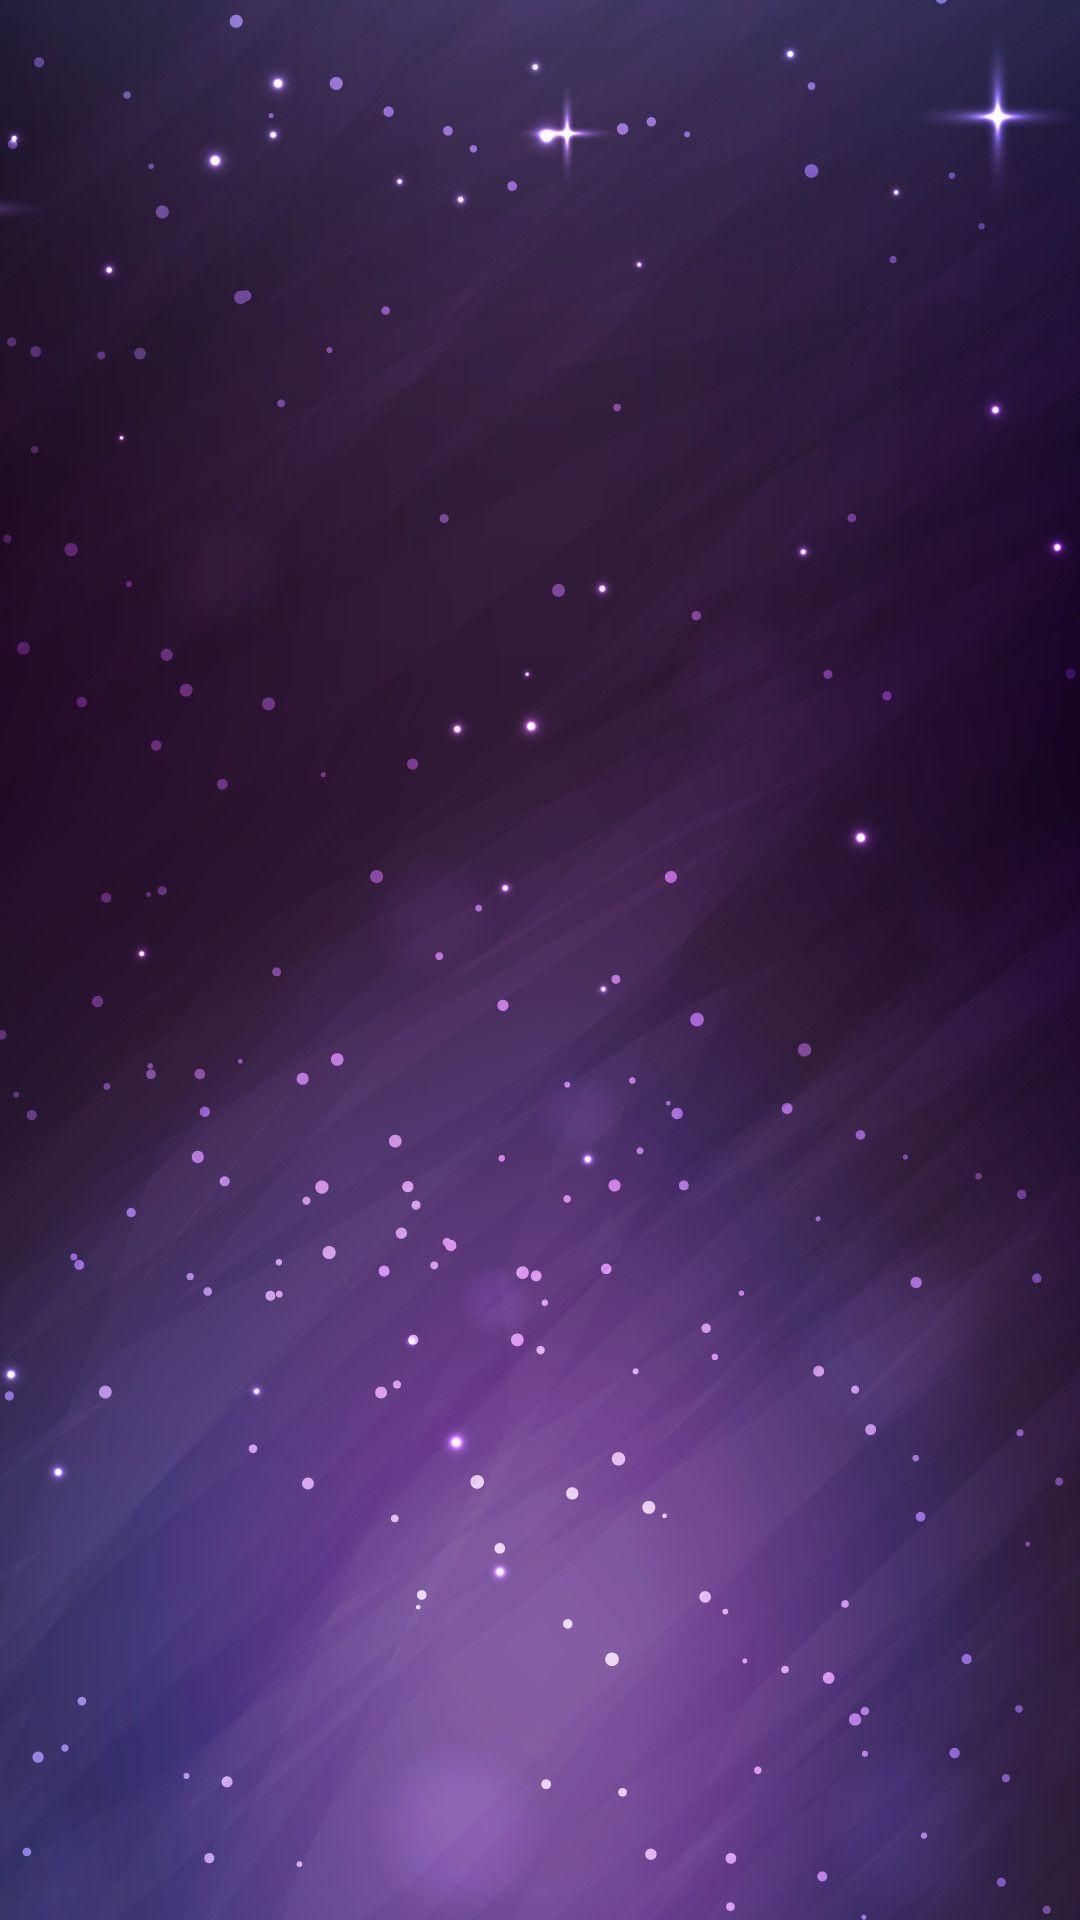 Purple Phone Wallpapers - Top Free ...